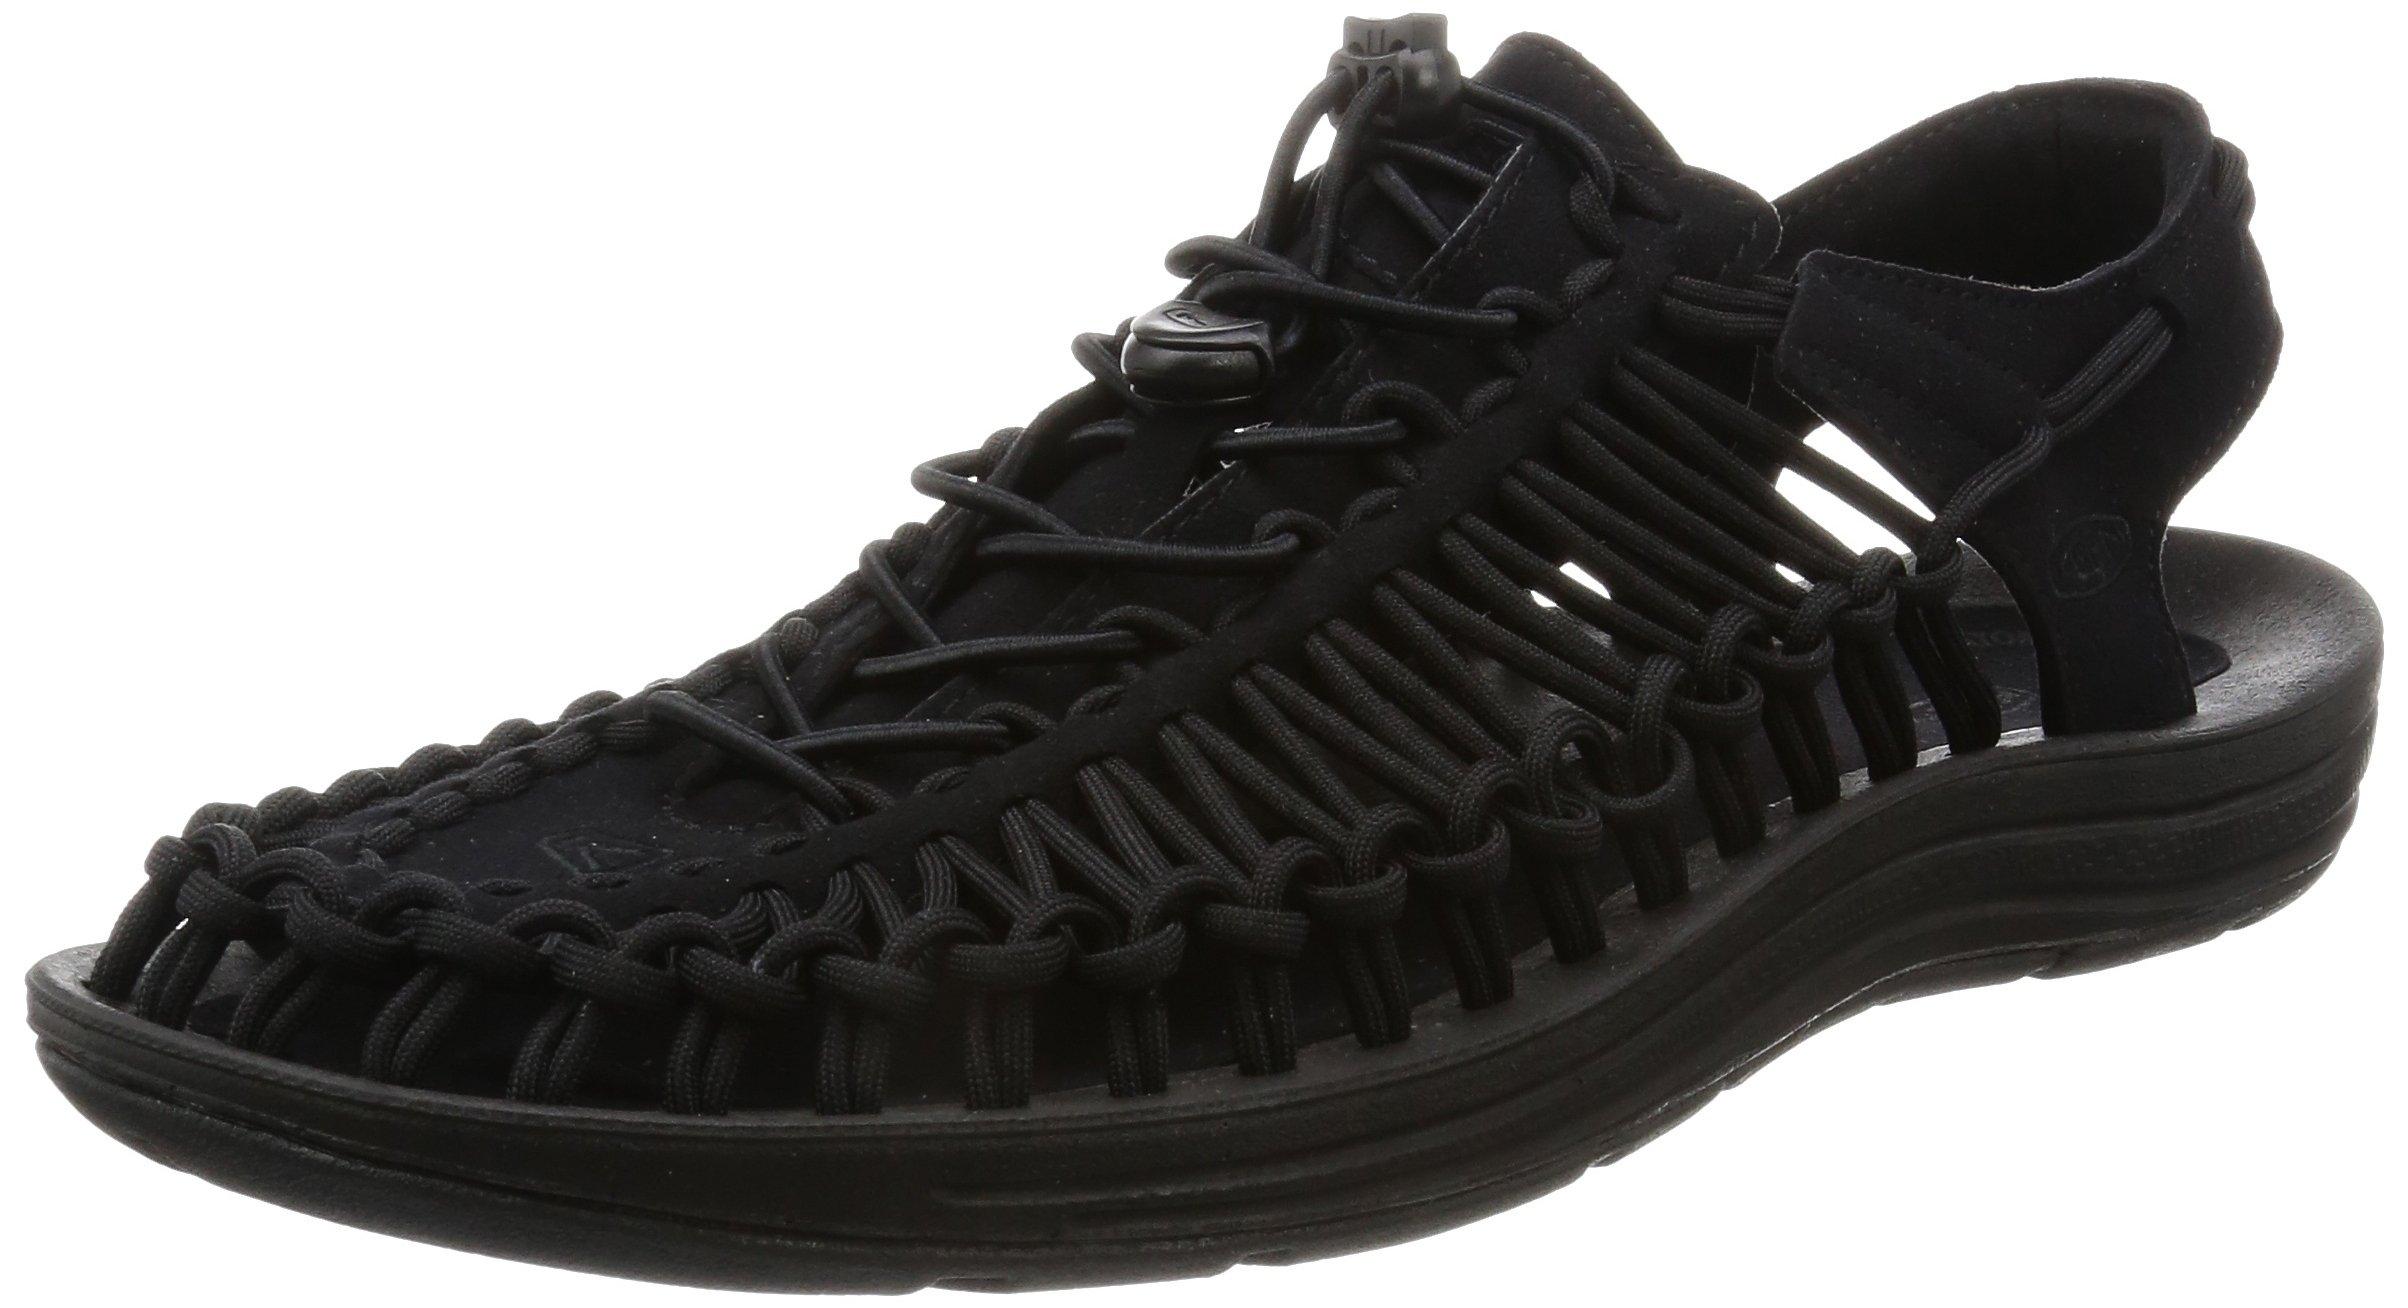 KEEN Men's Uneek Sandal, Black/Black, 14 M US